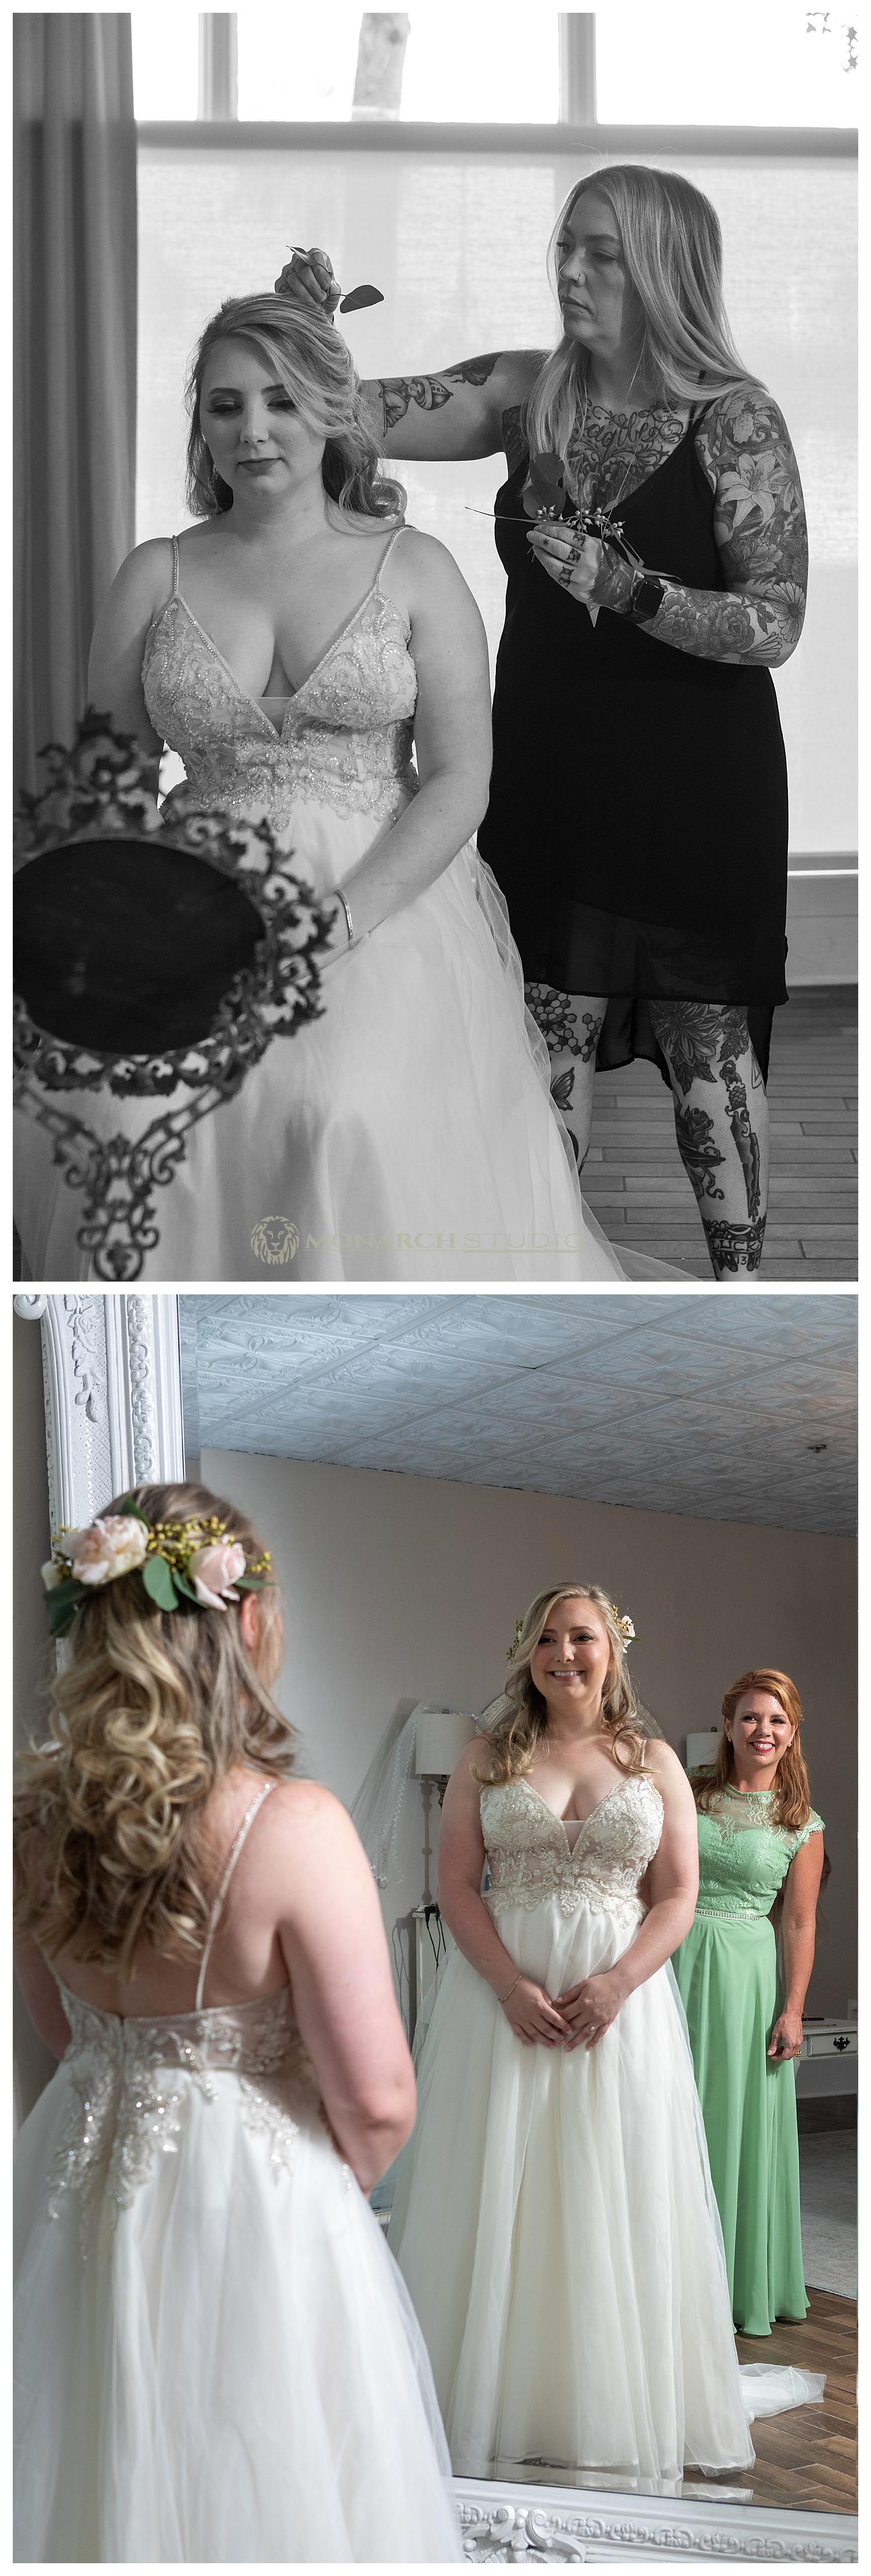 White Room Wedding Photographer 010.JPG